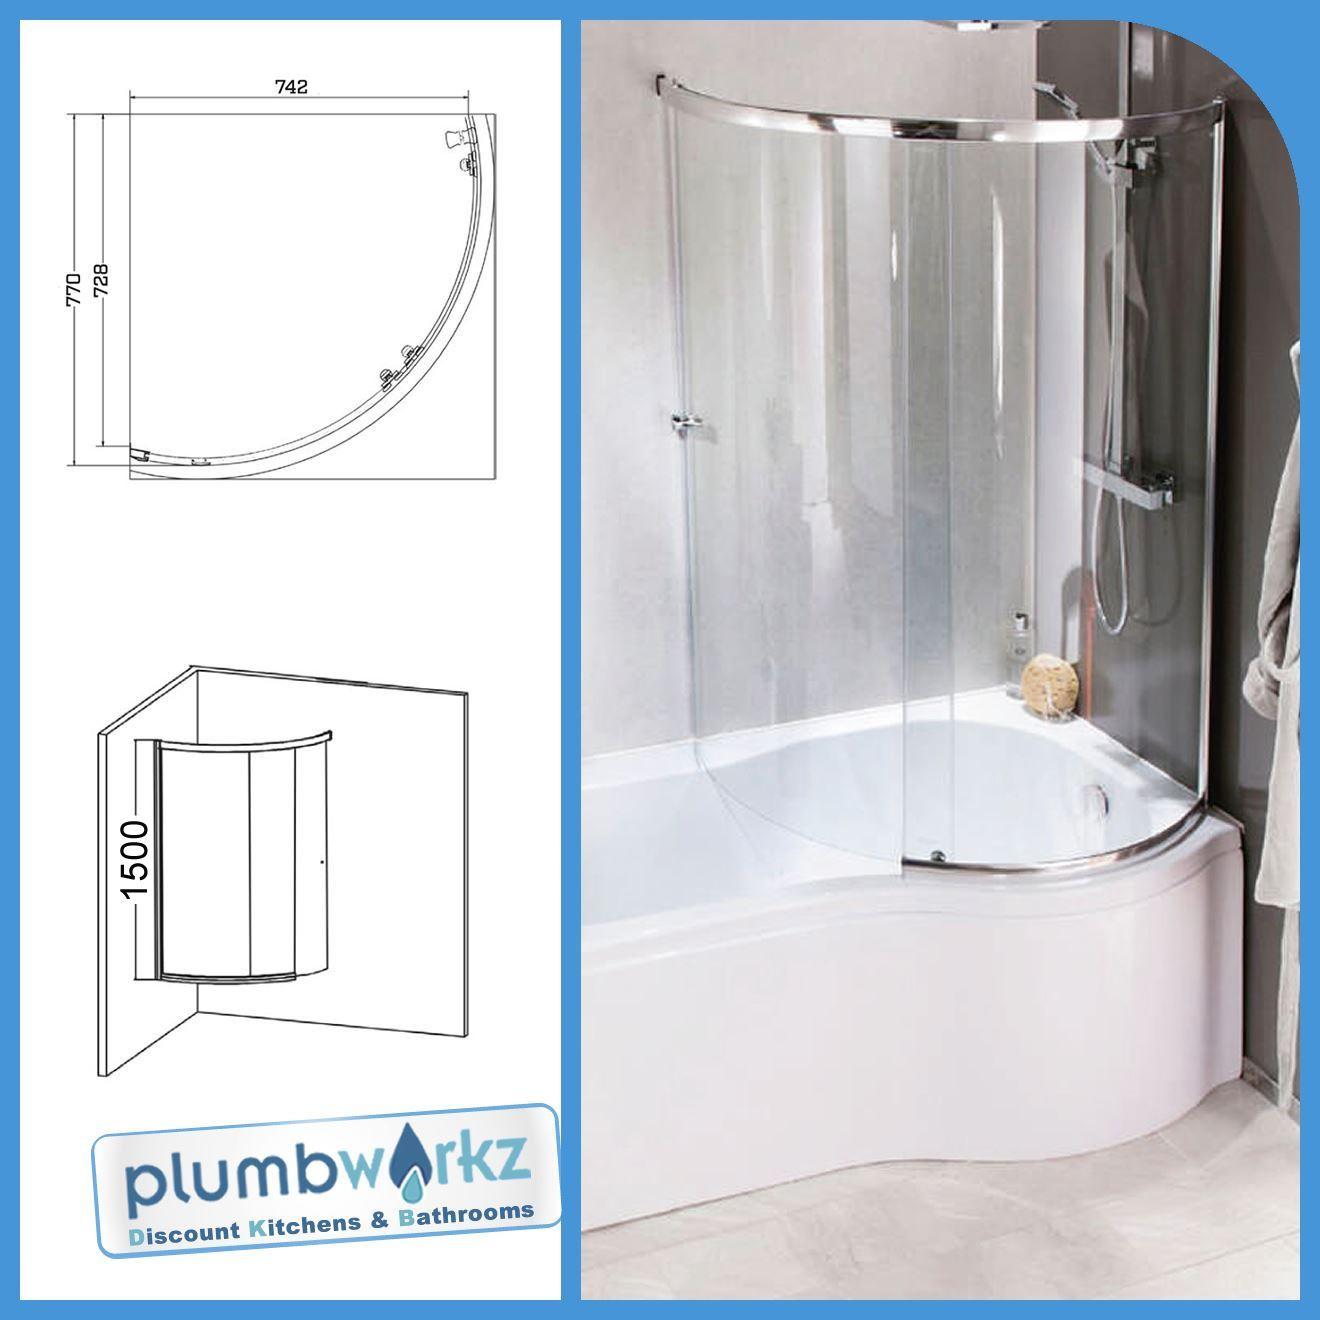 Details about P Shaped Bath 1500mm-1700mm Bath Full Enclosure Screen & Bath Panel